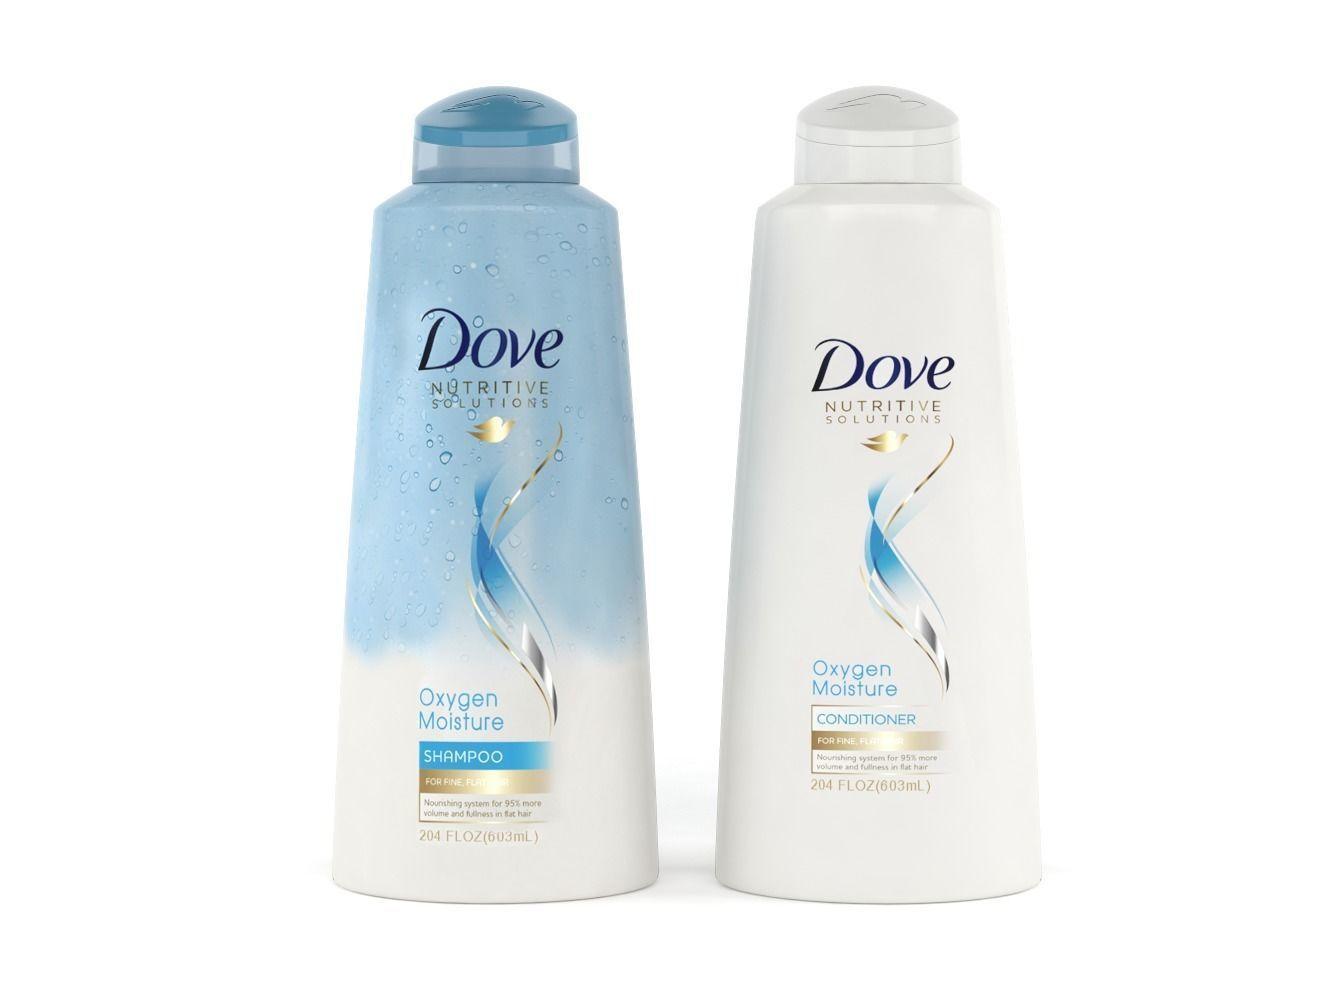 Dove Nutritive Solutions Oxygen Moisture Shampoo Conditioner